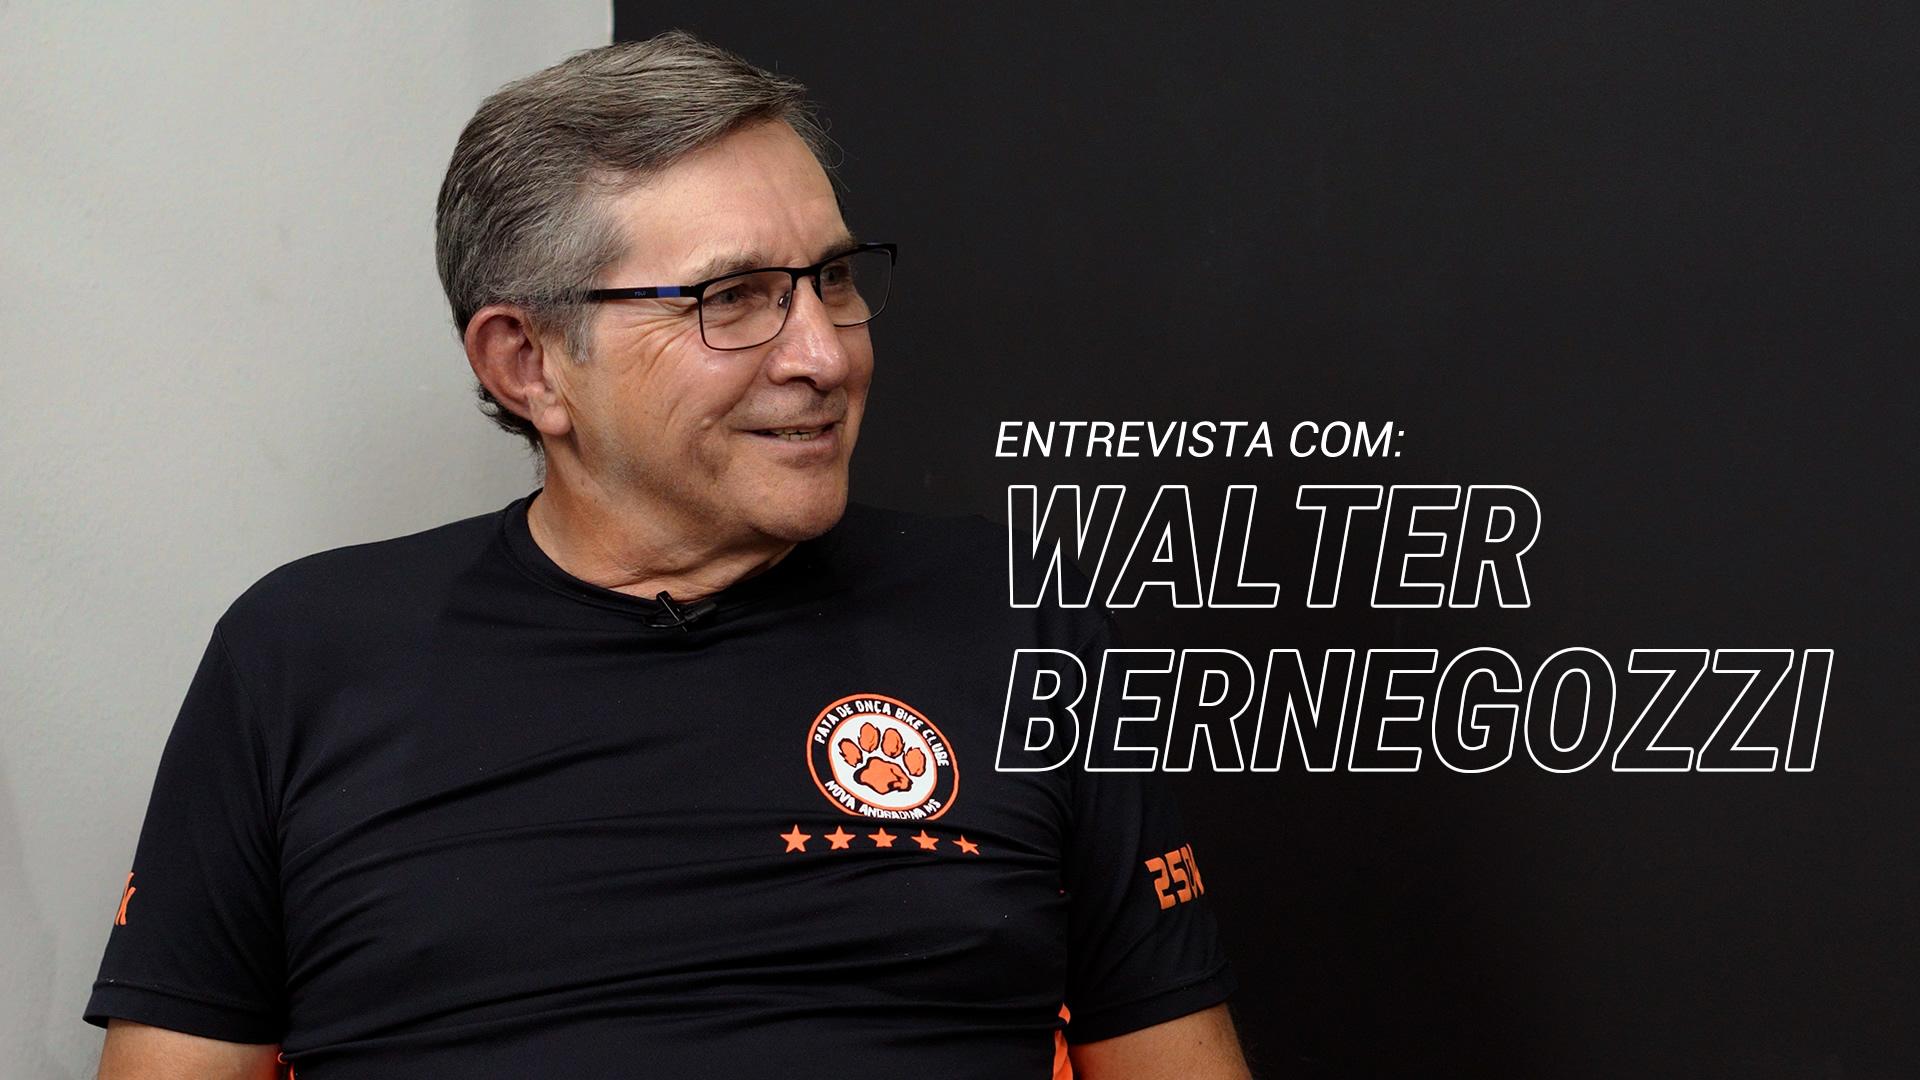 Walter bernegozzi